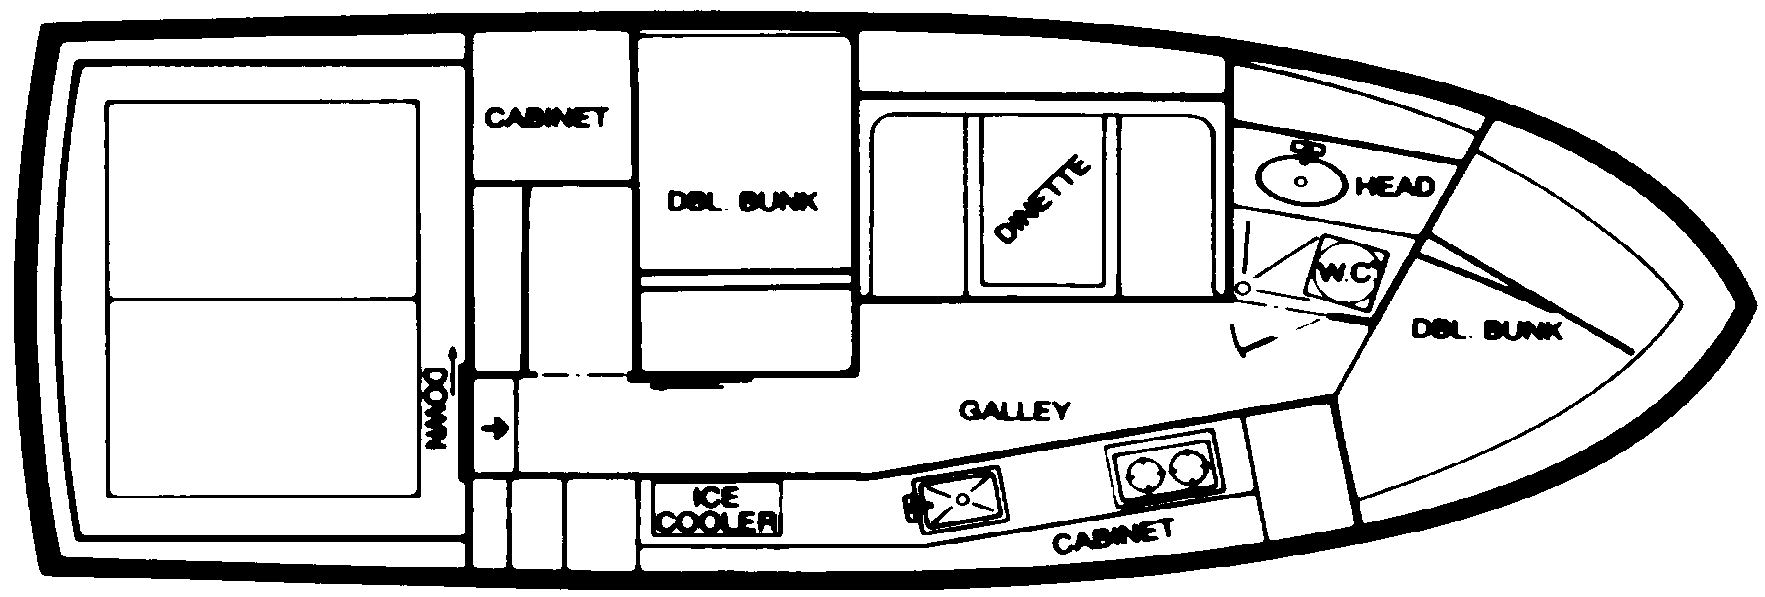 29 Sport Cruiser Floor Plan 1